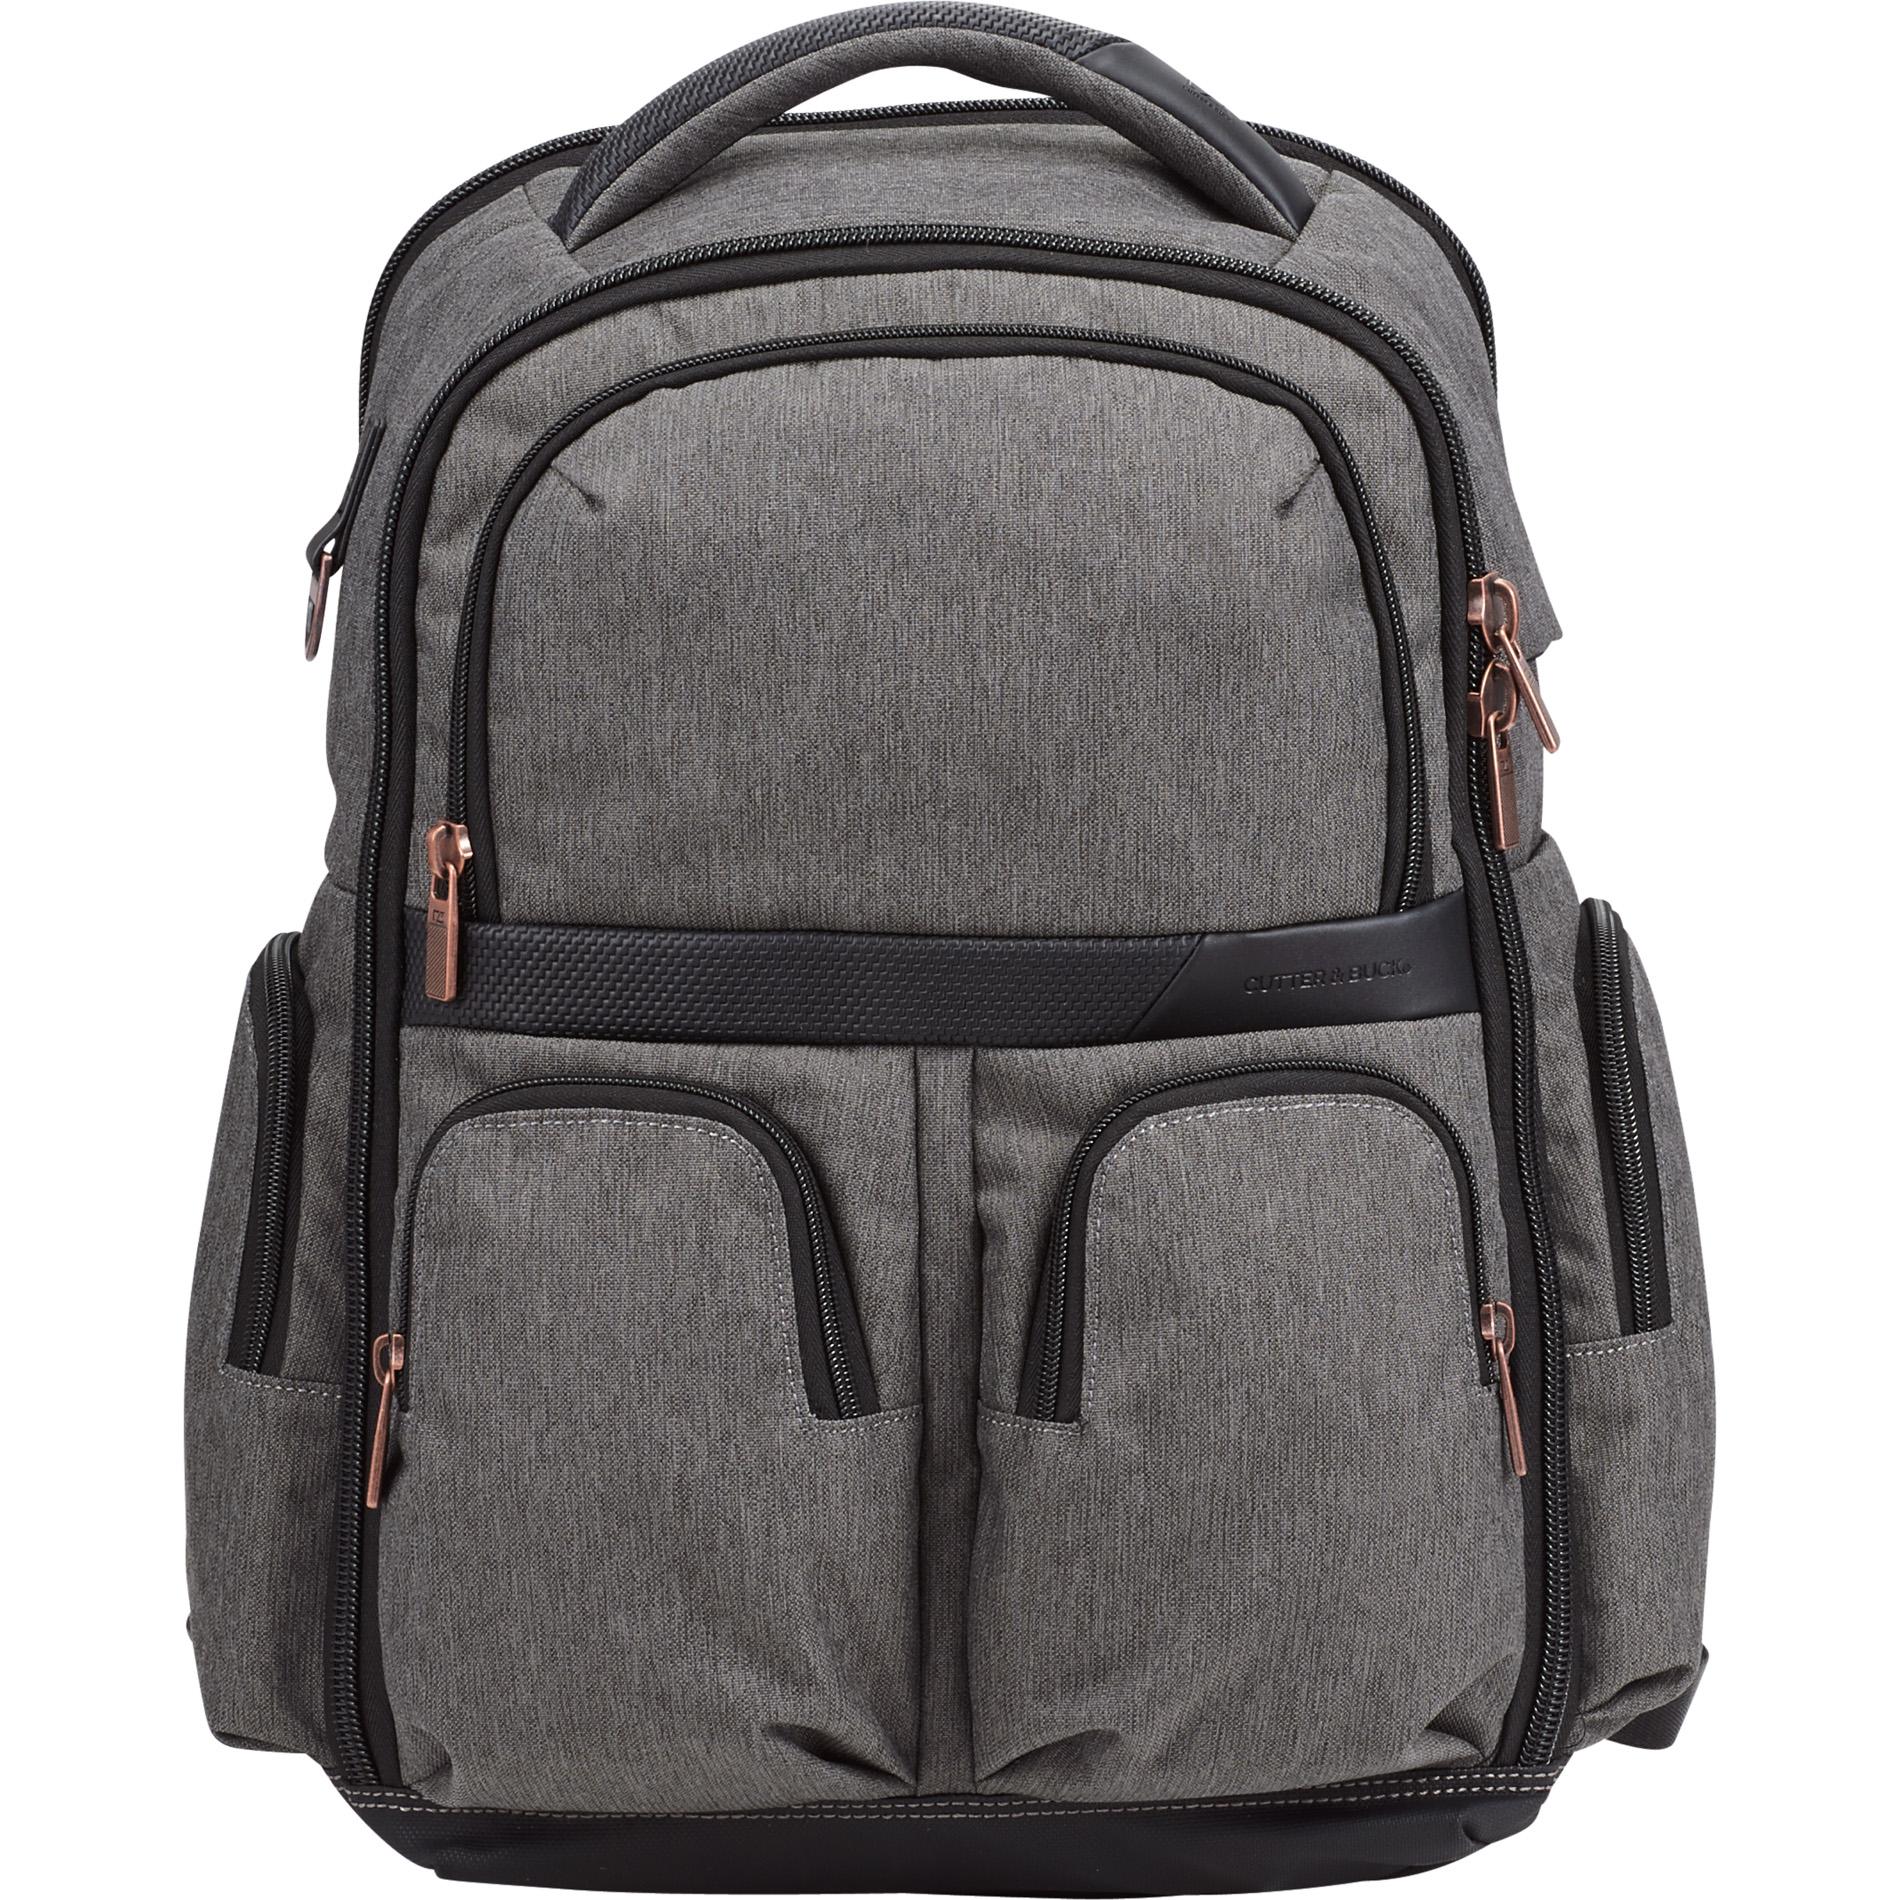 Cutter & Buck 9870-57 - Executive Backpack